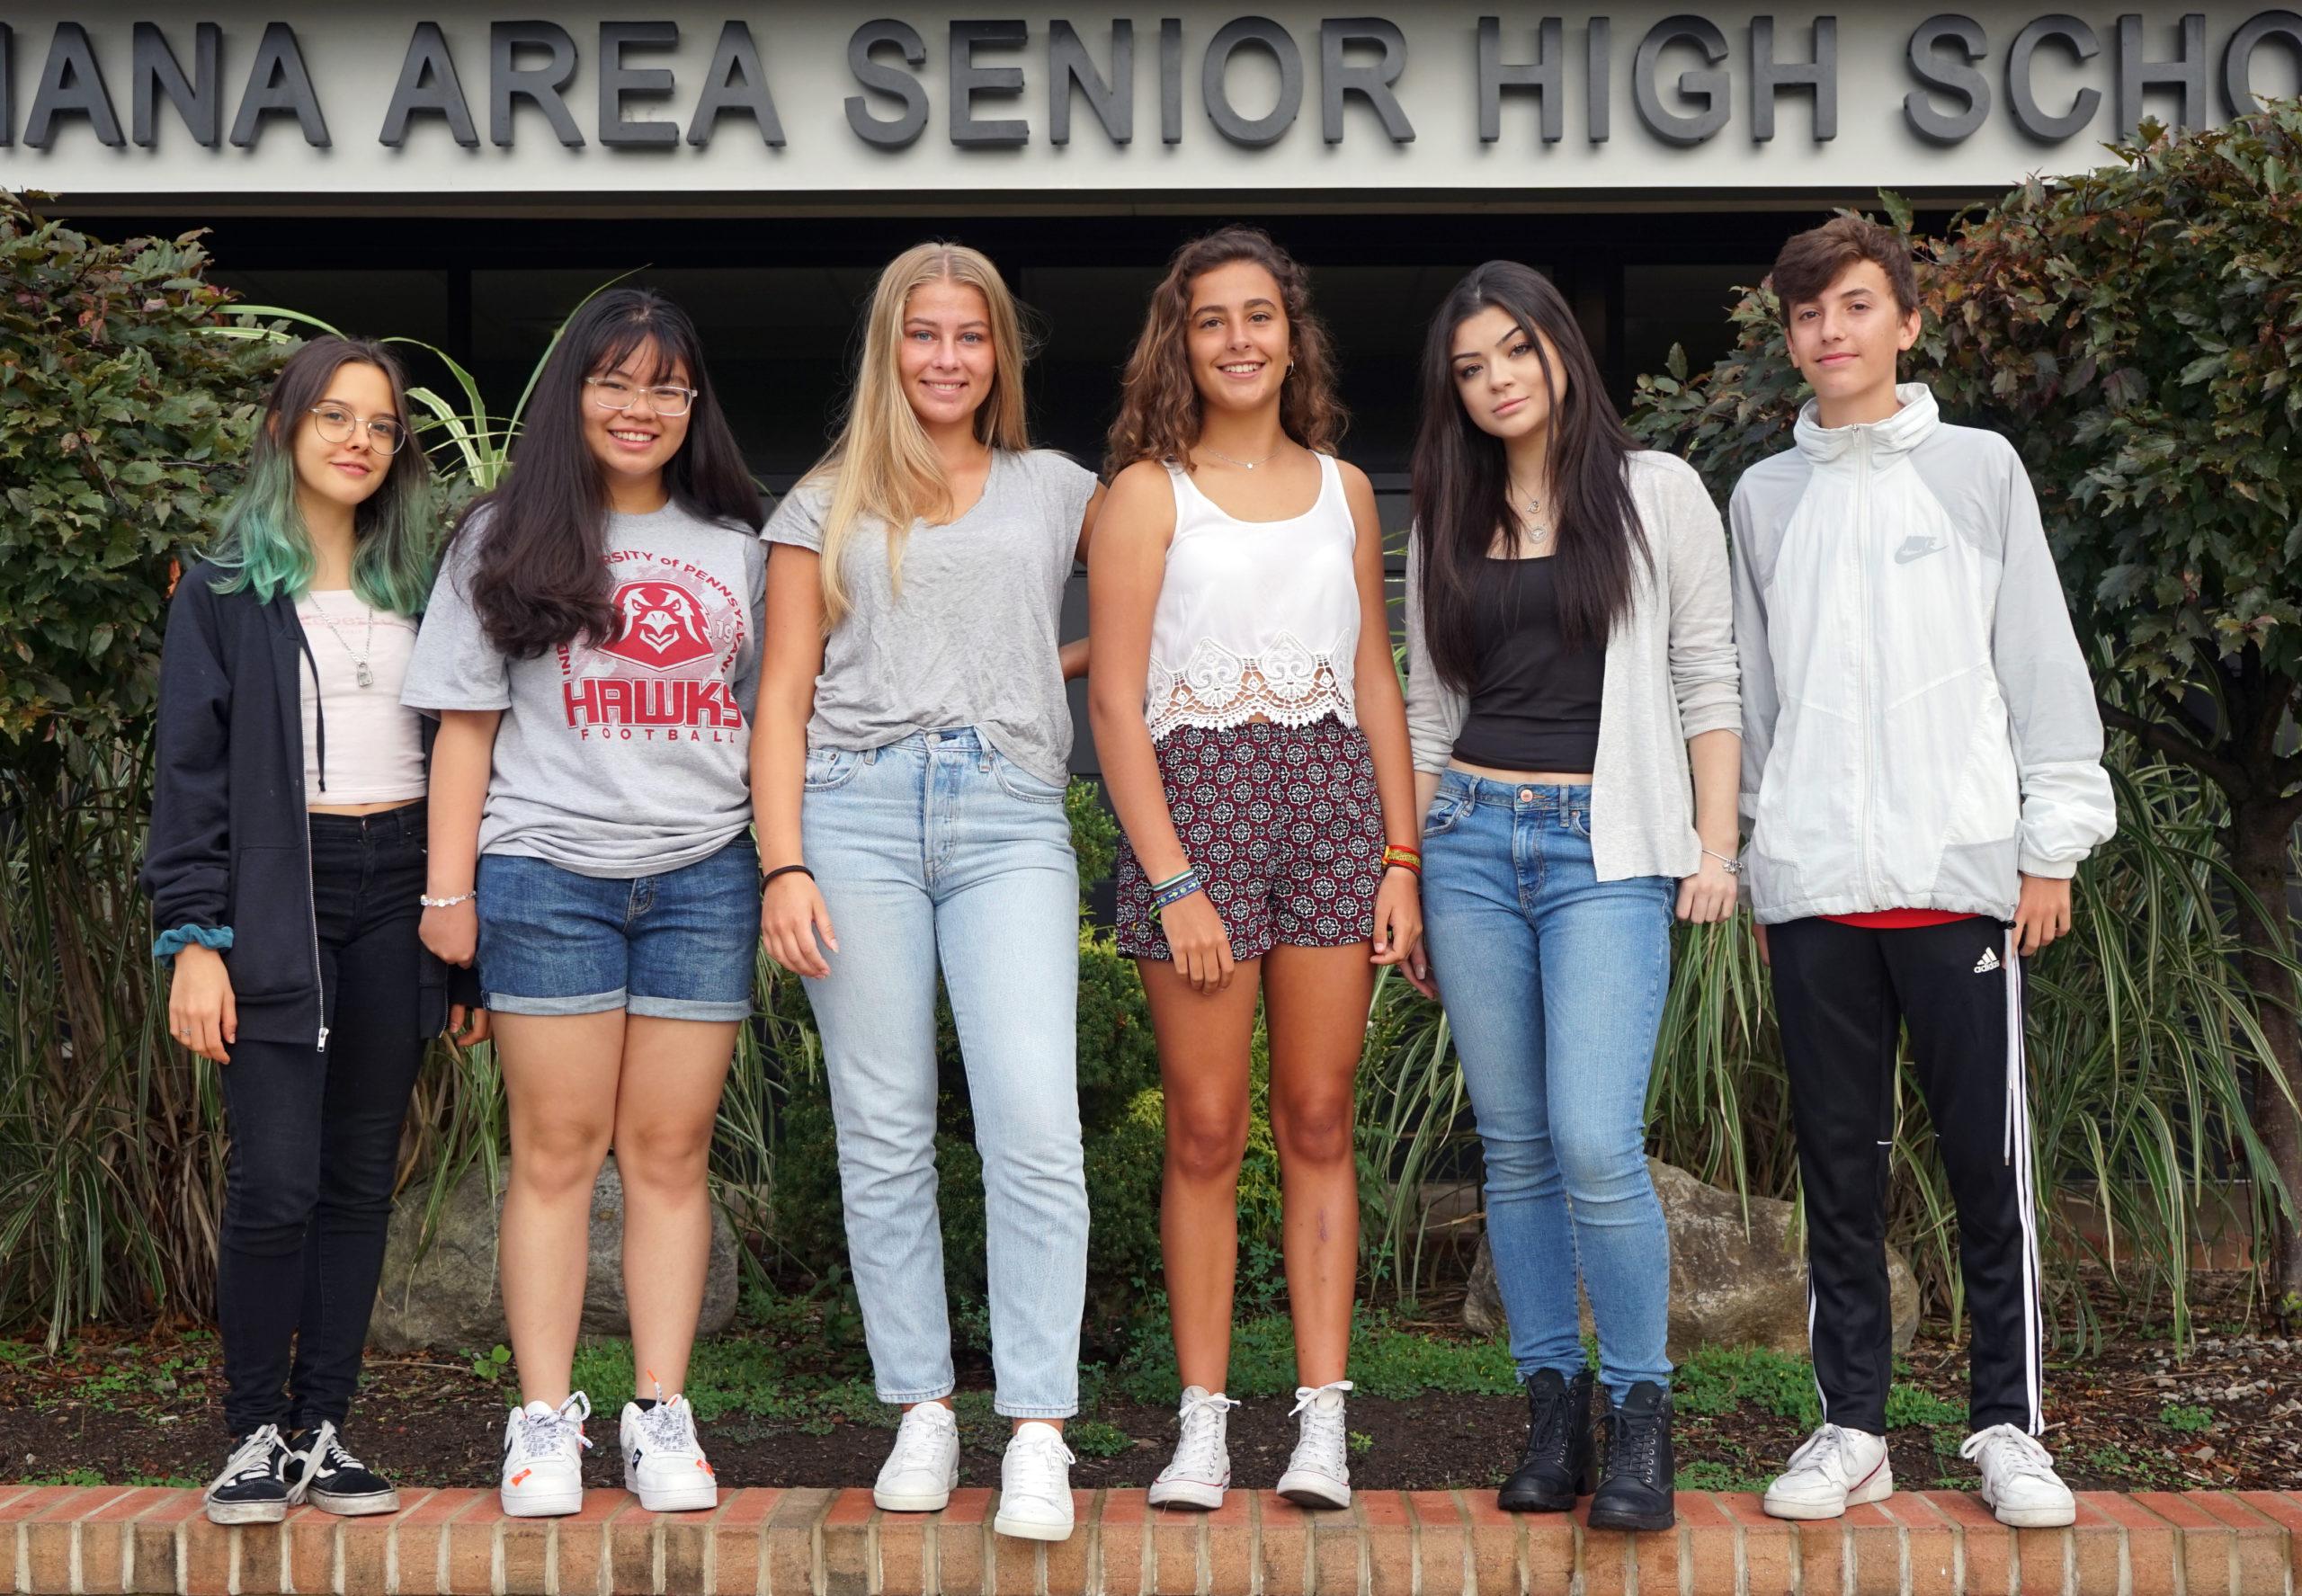 Exchange Students Travel to IHS